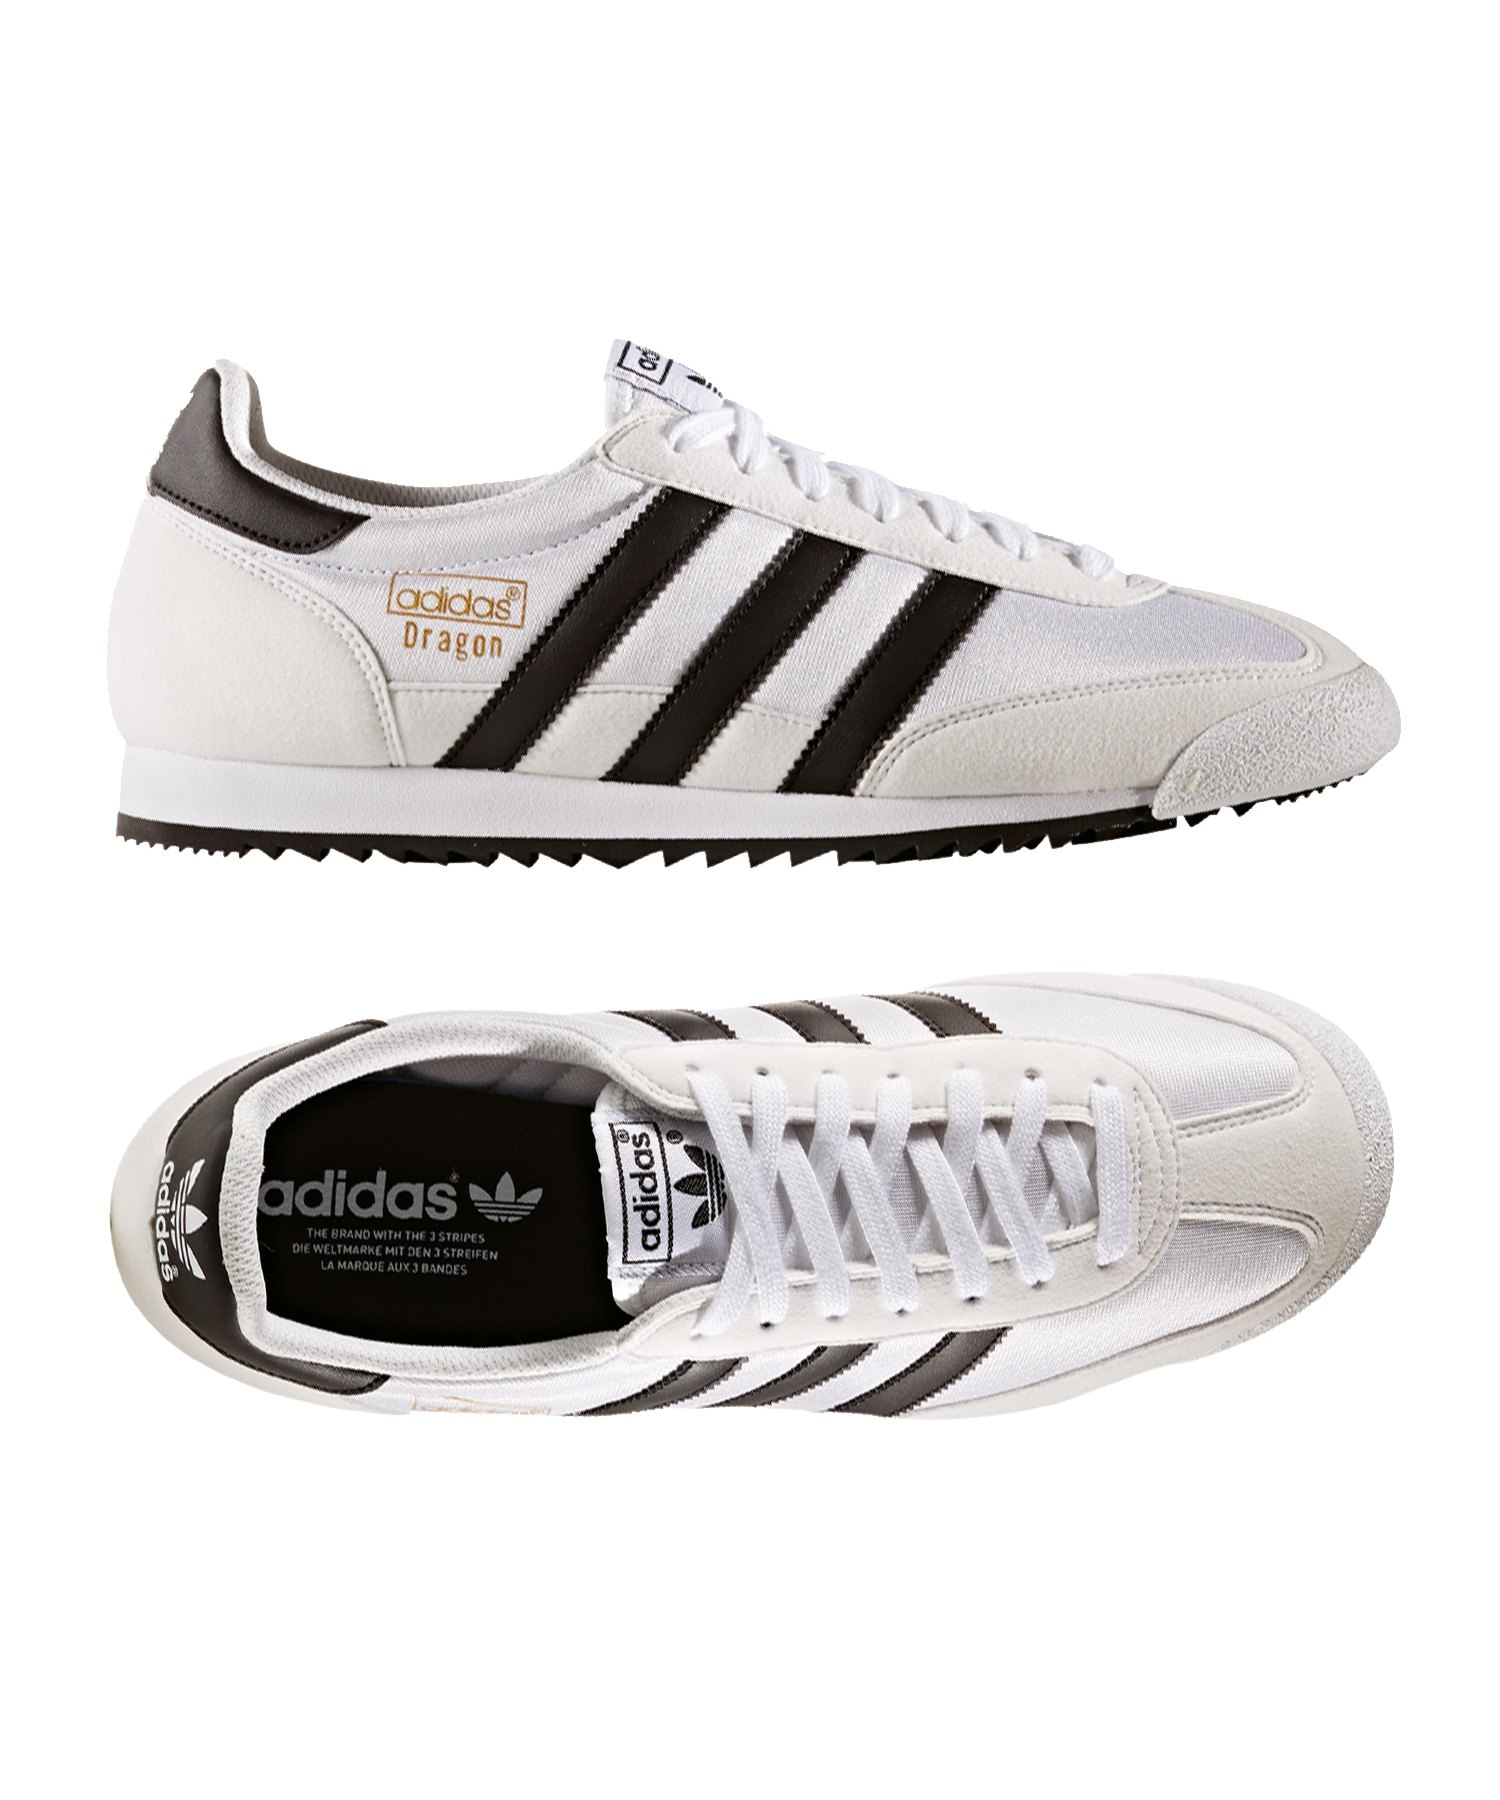 DRAGON OG Schuhe Weiß Adidas Herren Originals Schuhe